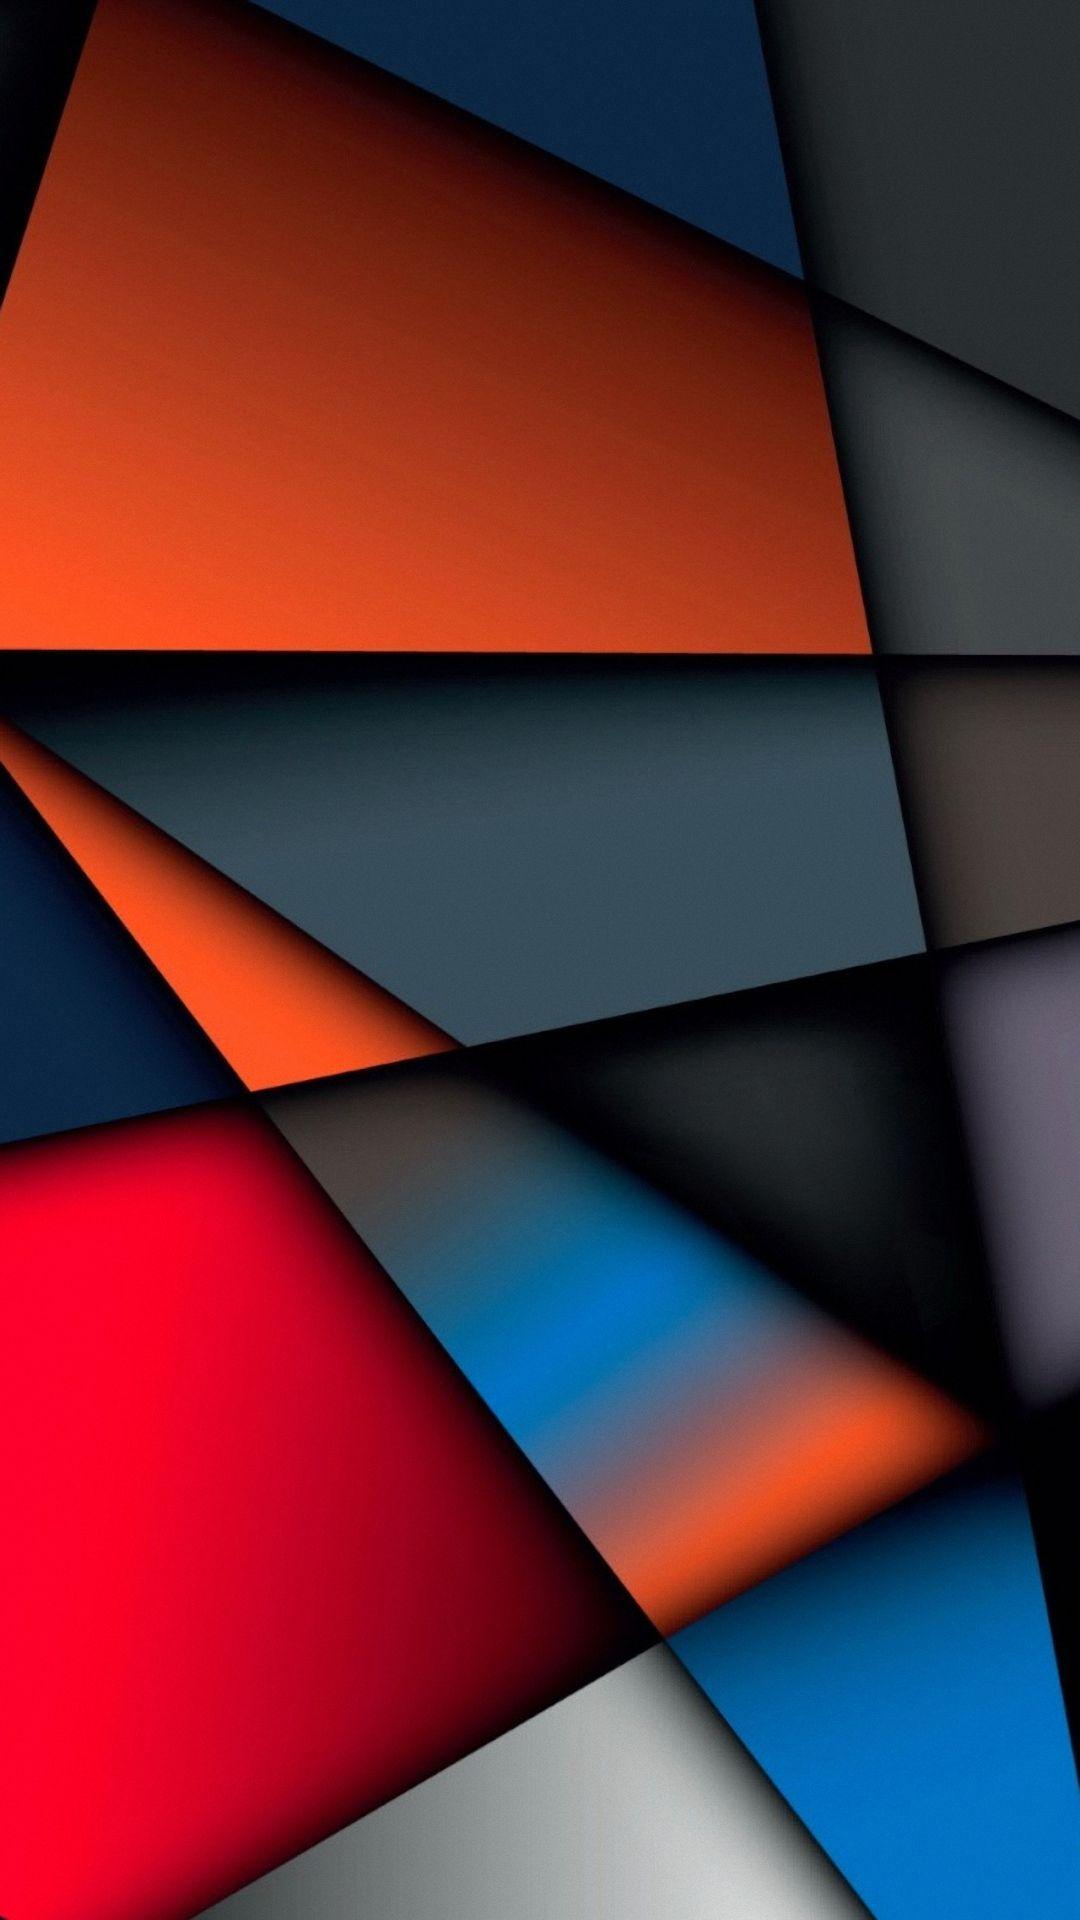 Abstract Iphone Wallpaper Abstract Iphone Wallpaper Background Hd Wallpaper Cellphone Wallpaper